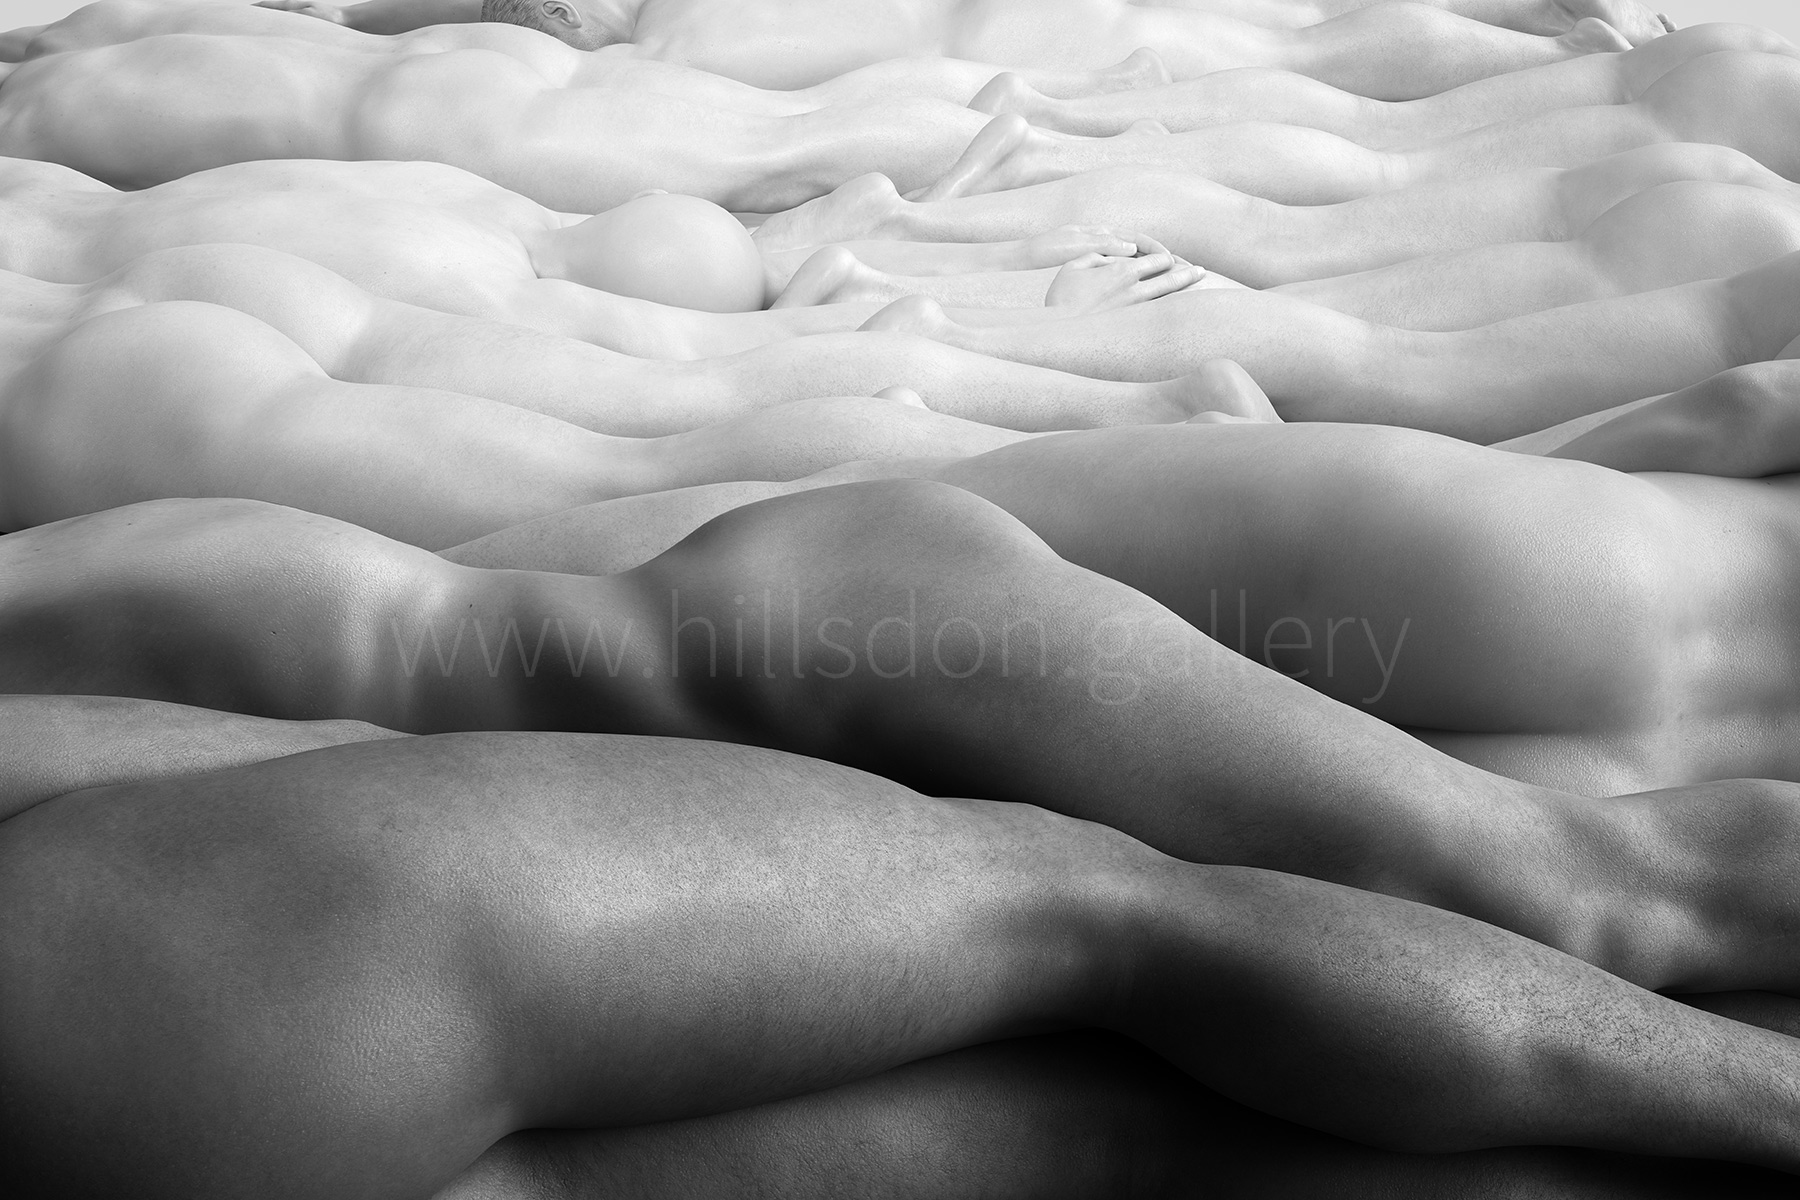 Dudescape in White by Mark Hillsdon